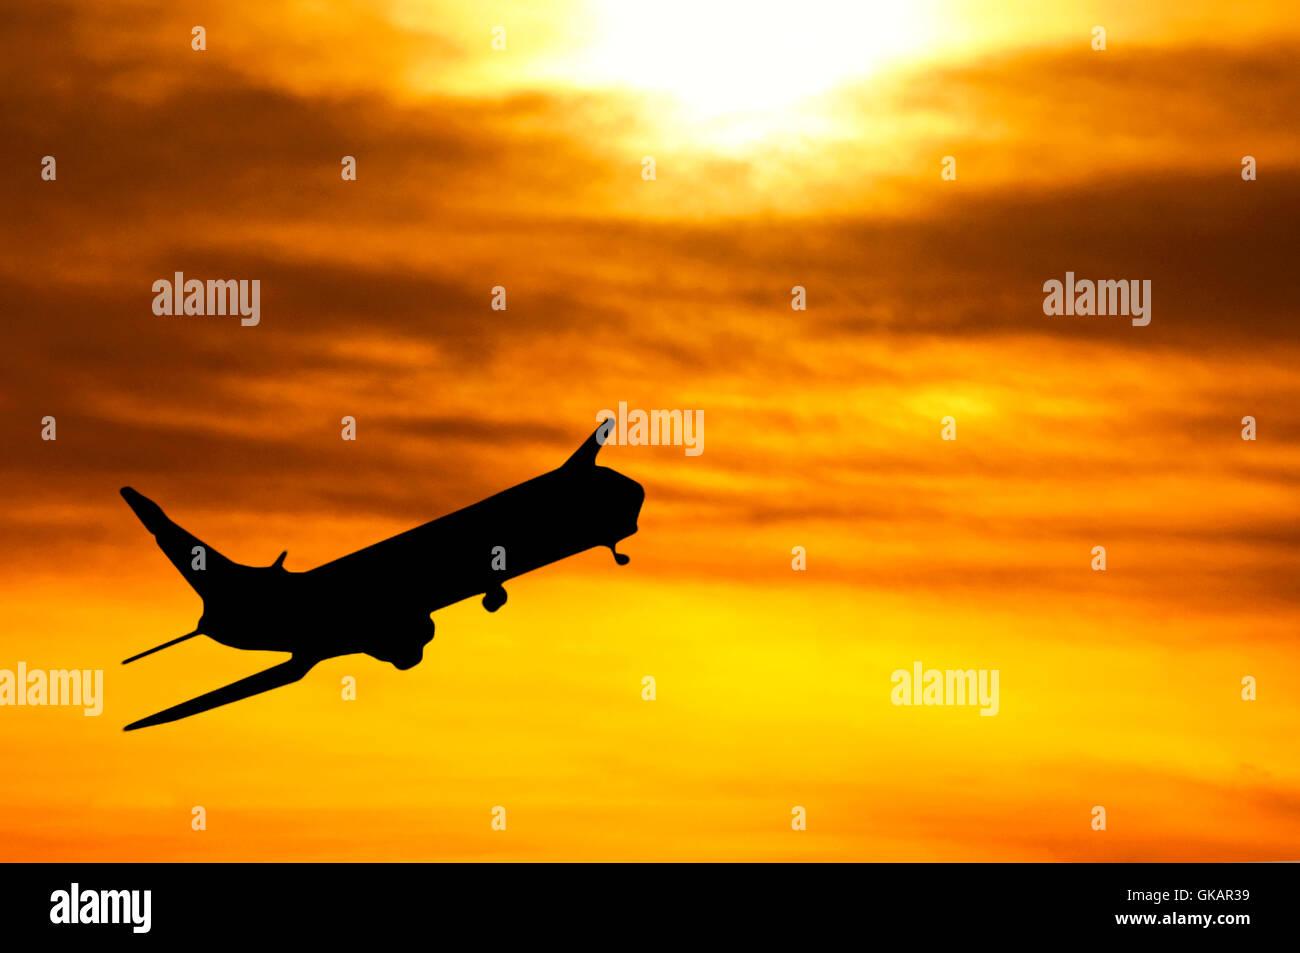 travel holiday vacation - Stock Image